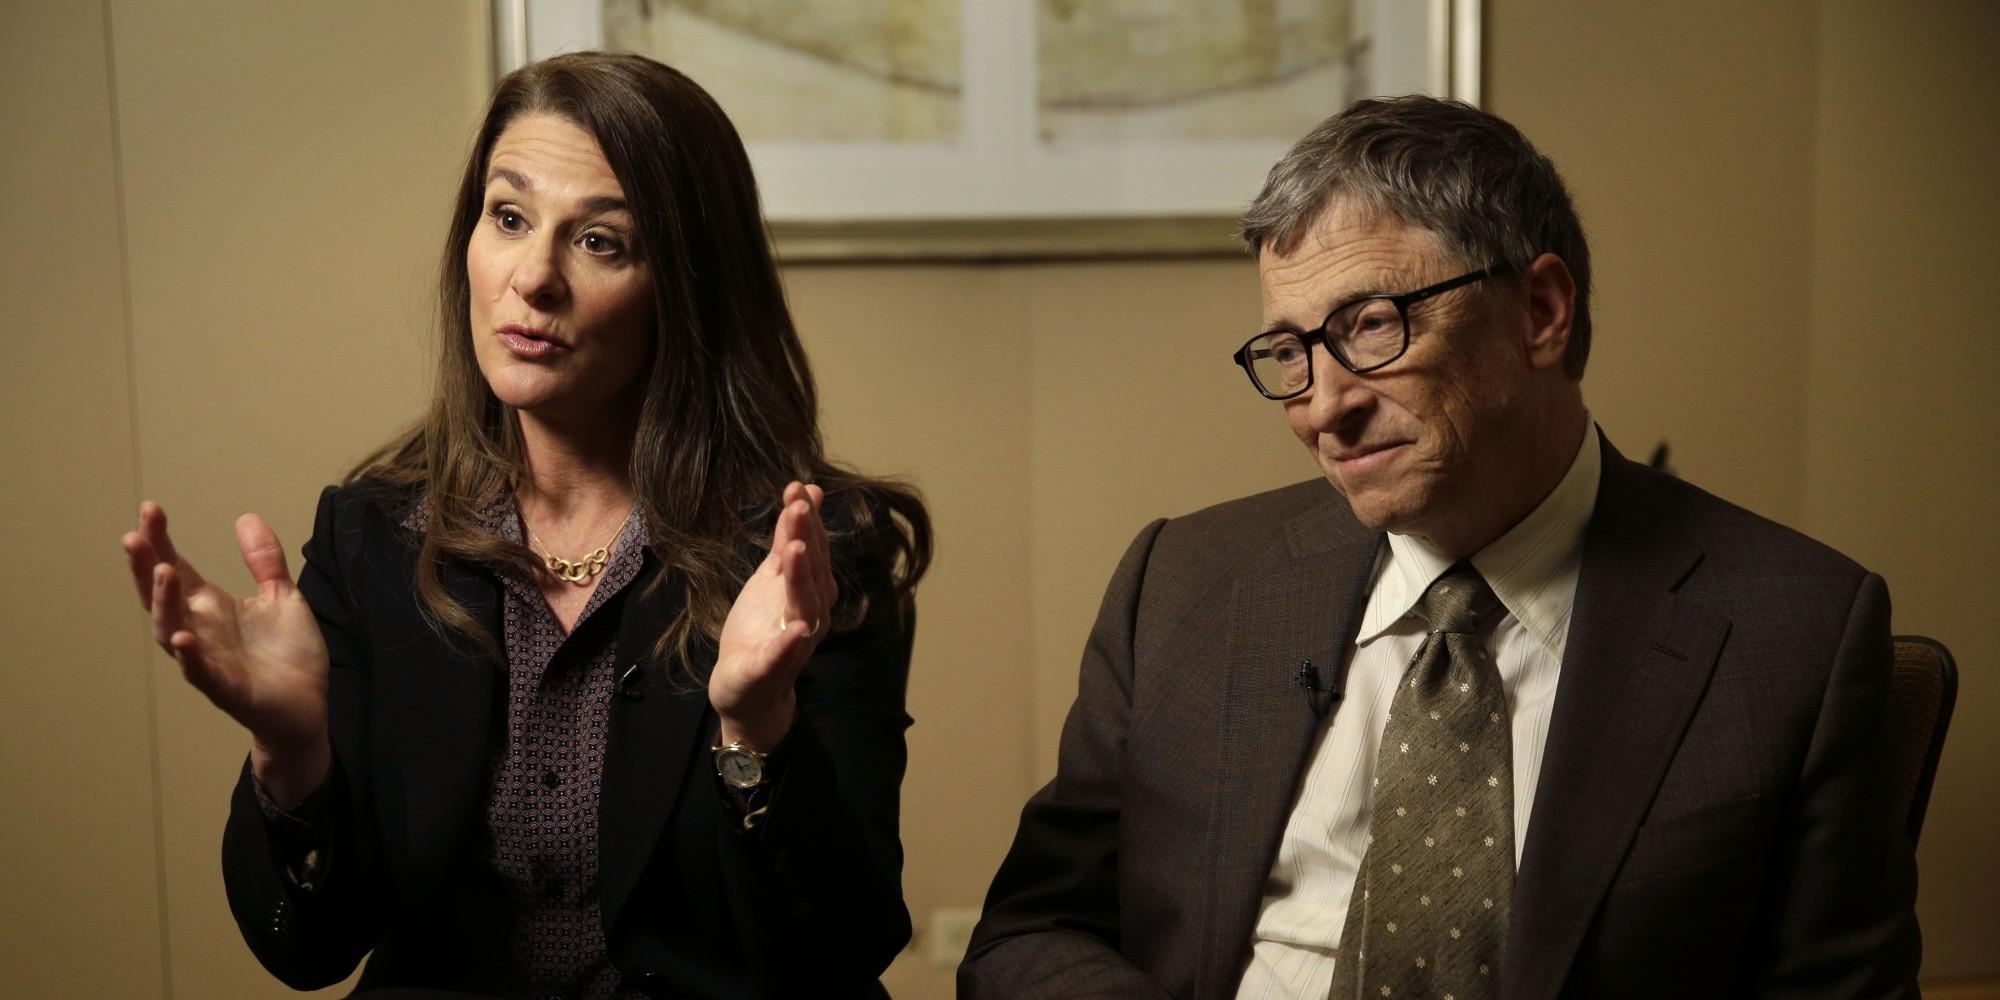 Bill Melinda Gates Foundation: Bill And Melinda Gates: Autopsies Could Prevent Epidemics